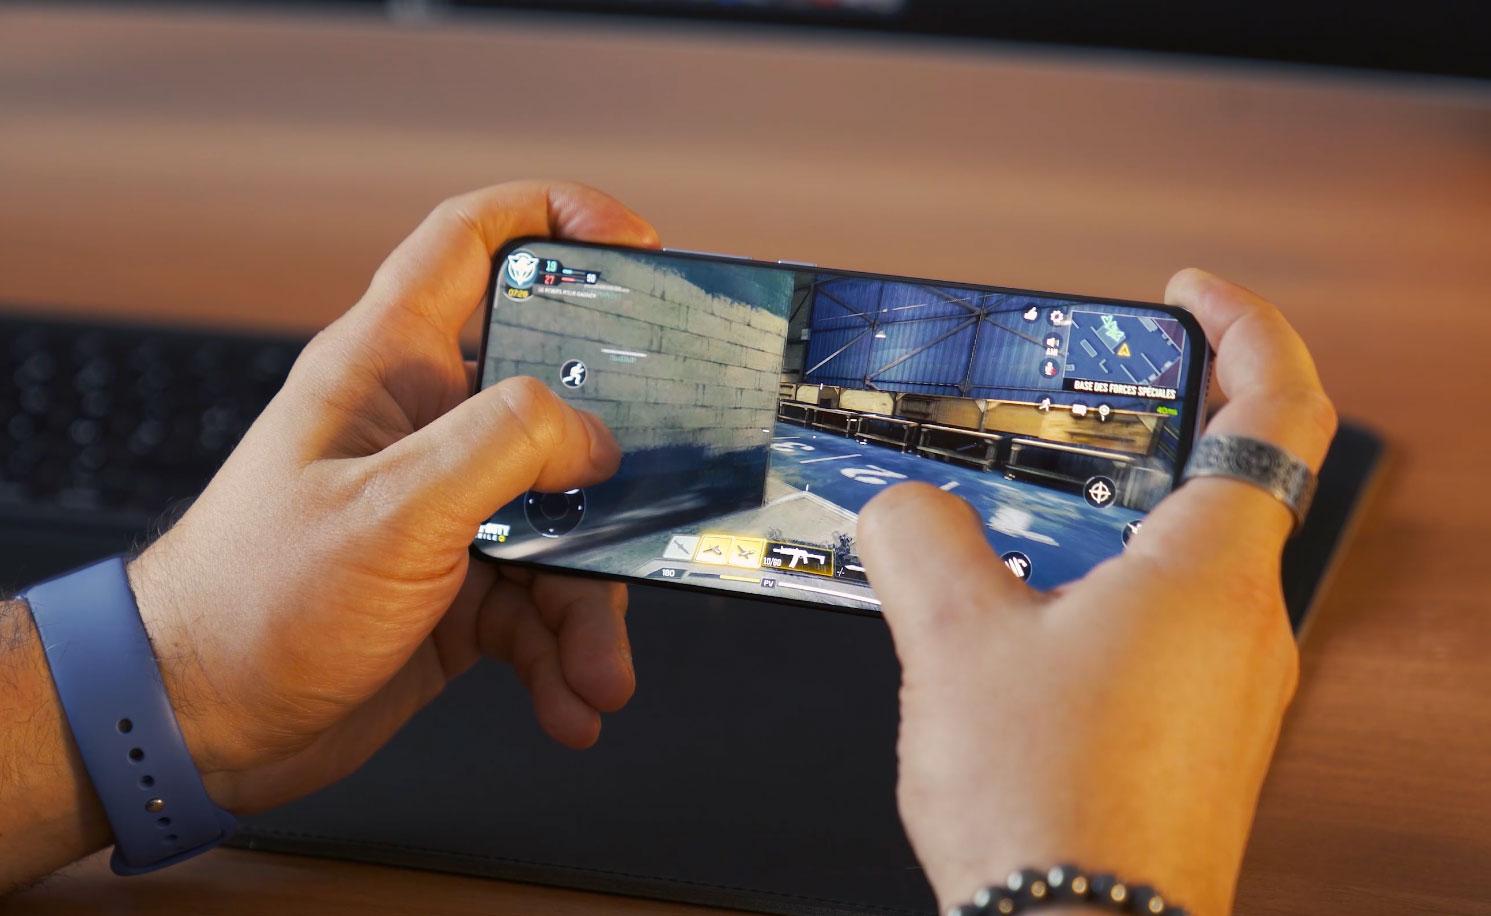 Le Xiaomi Mi 11 ne craint aucun jeu